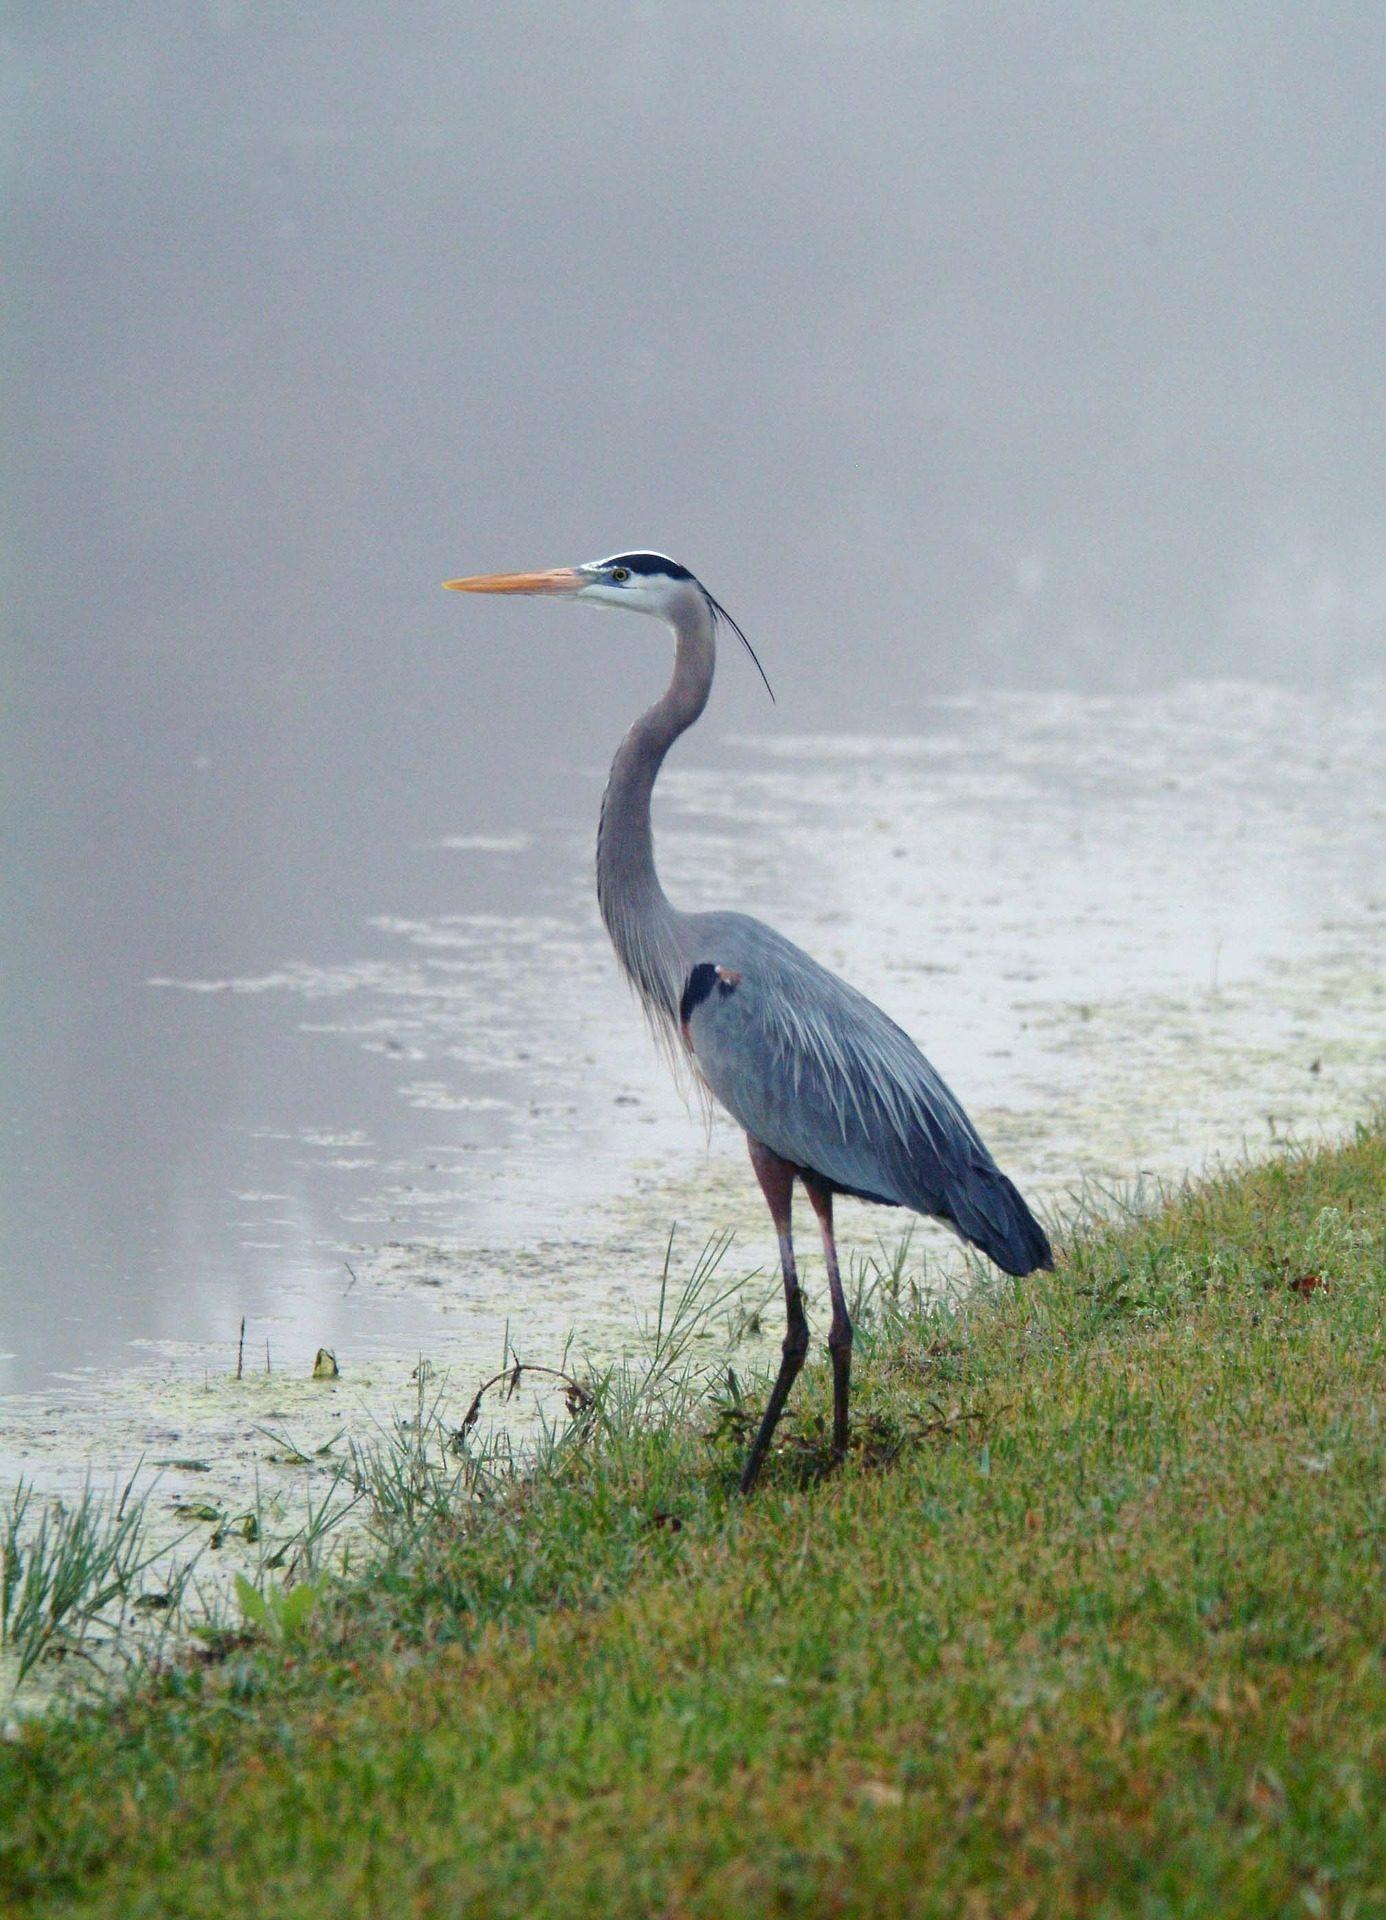 grulla, pájaro, ave, pantano, laguna, salvaje, libertad - Fondos de Pantalla HD - professor-falken.com